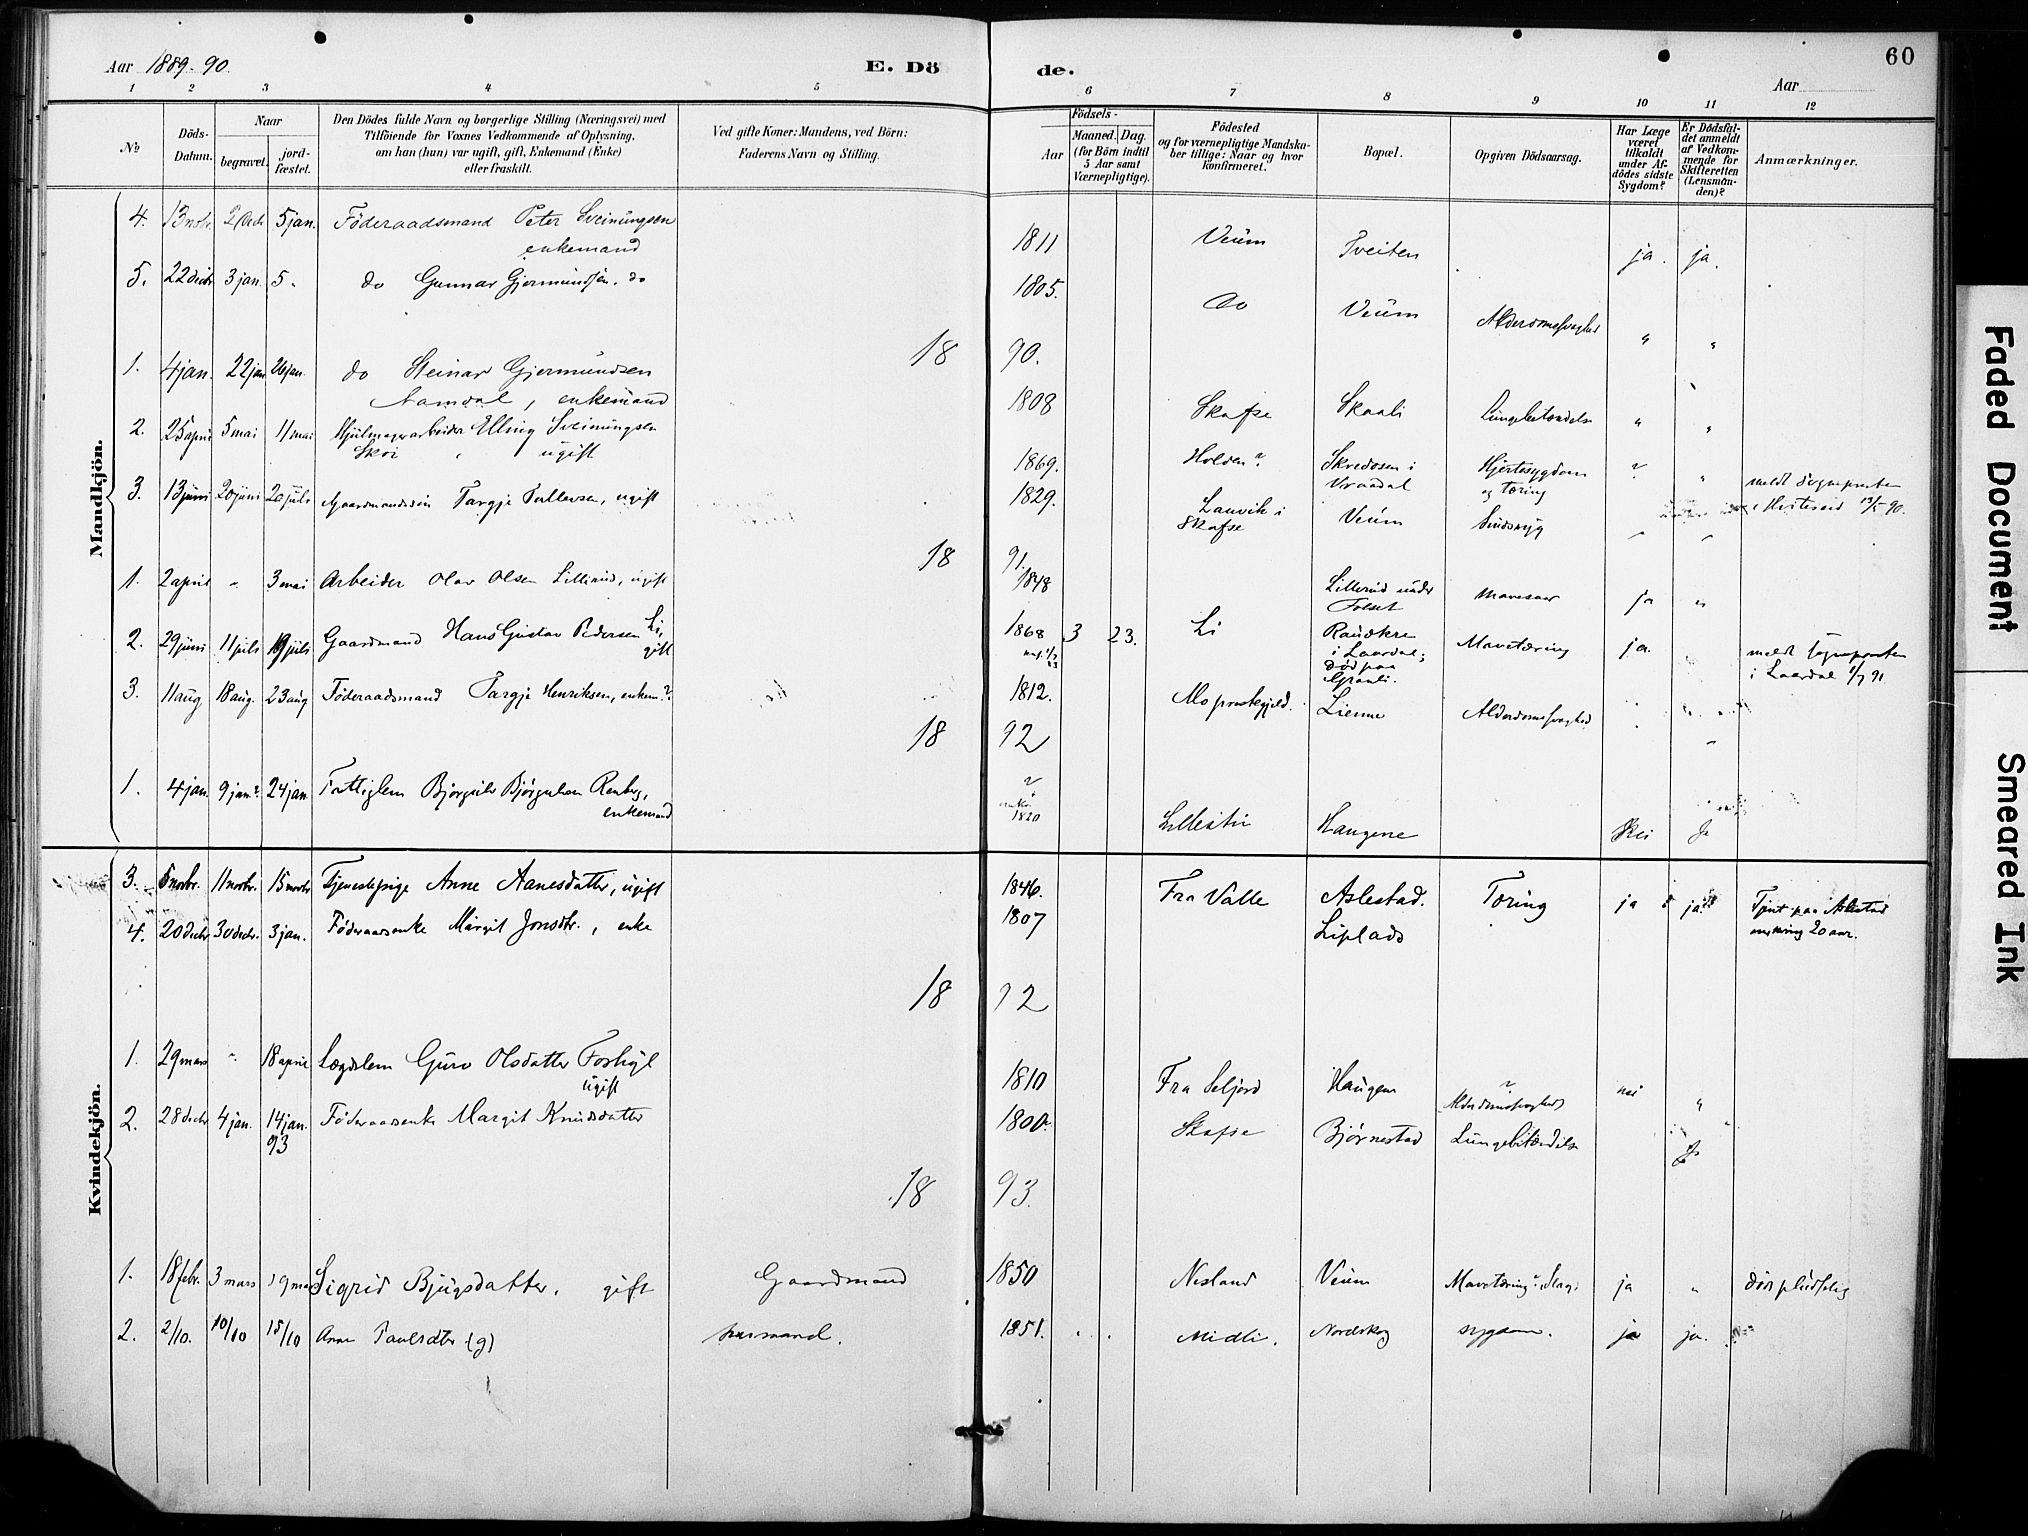 SAKO, Fyresdal kirkebøker, F/Fb/L0003: Parish register (official) no. II 3, 1887-1903, p. 60